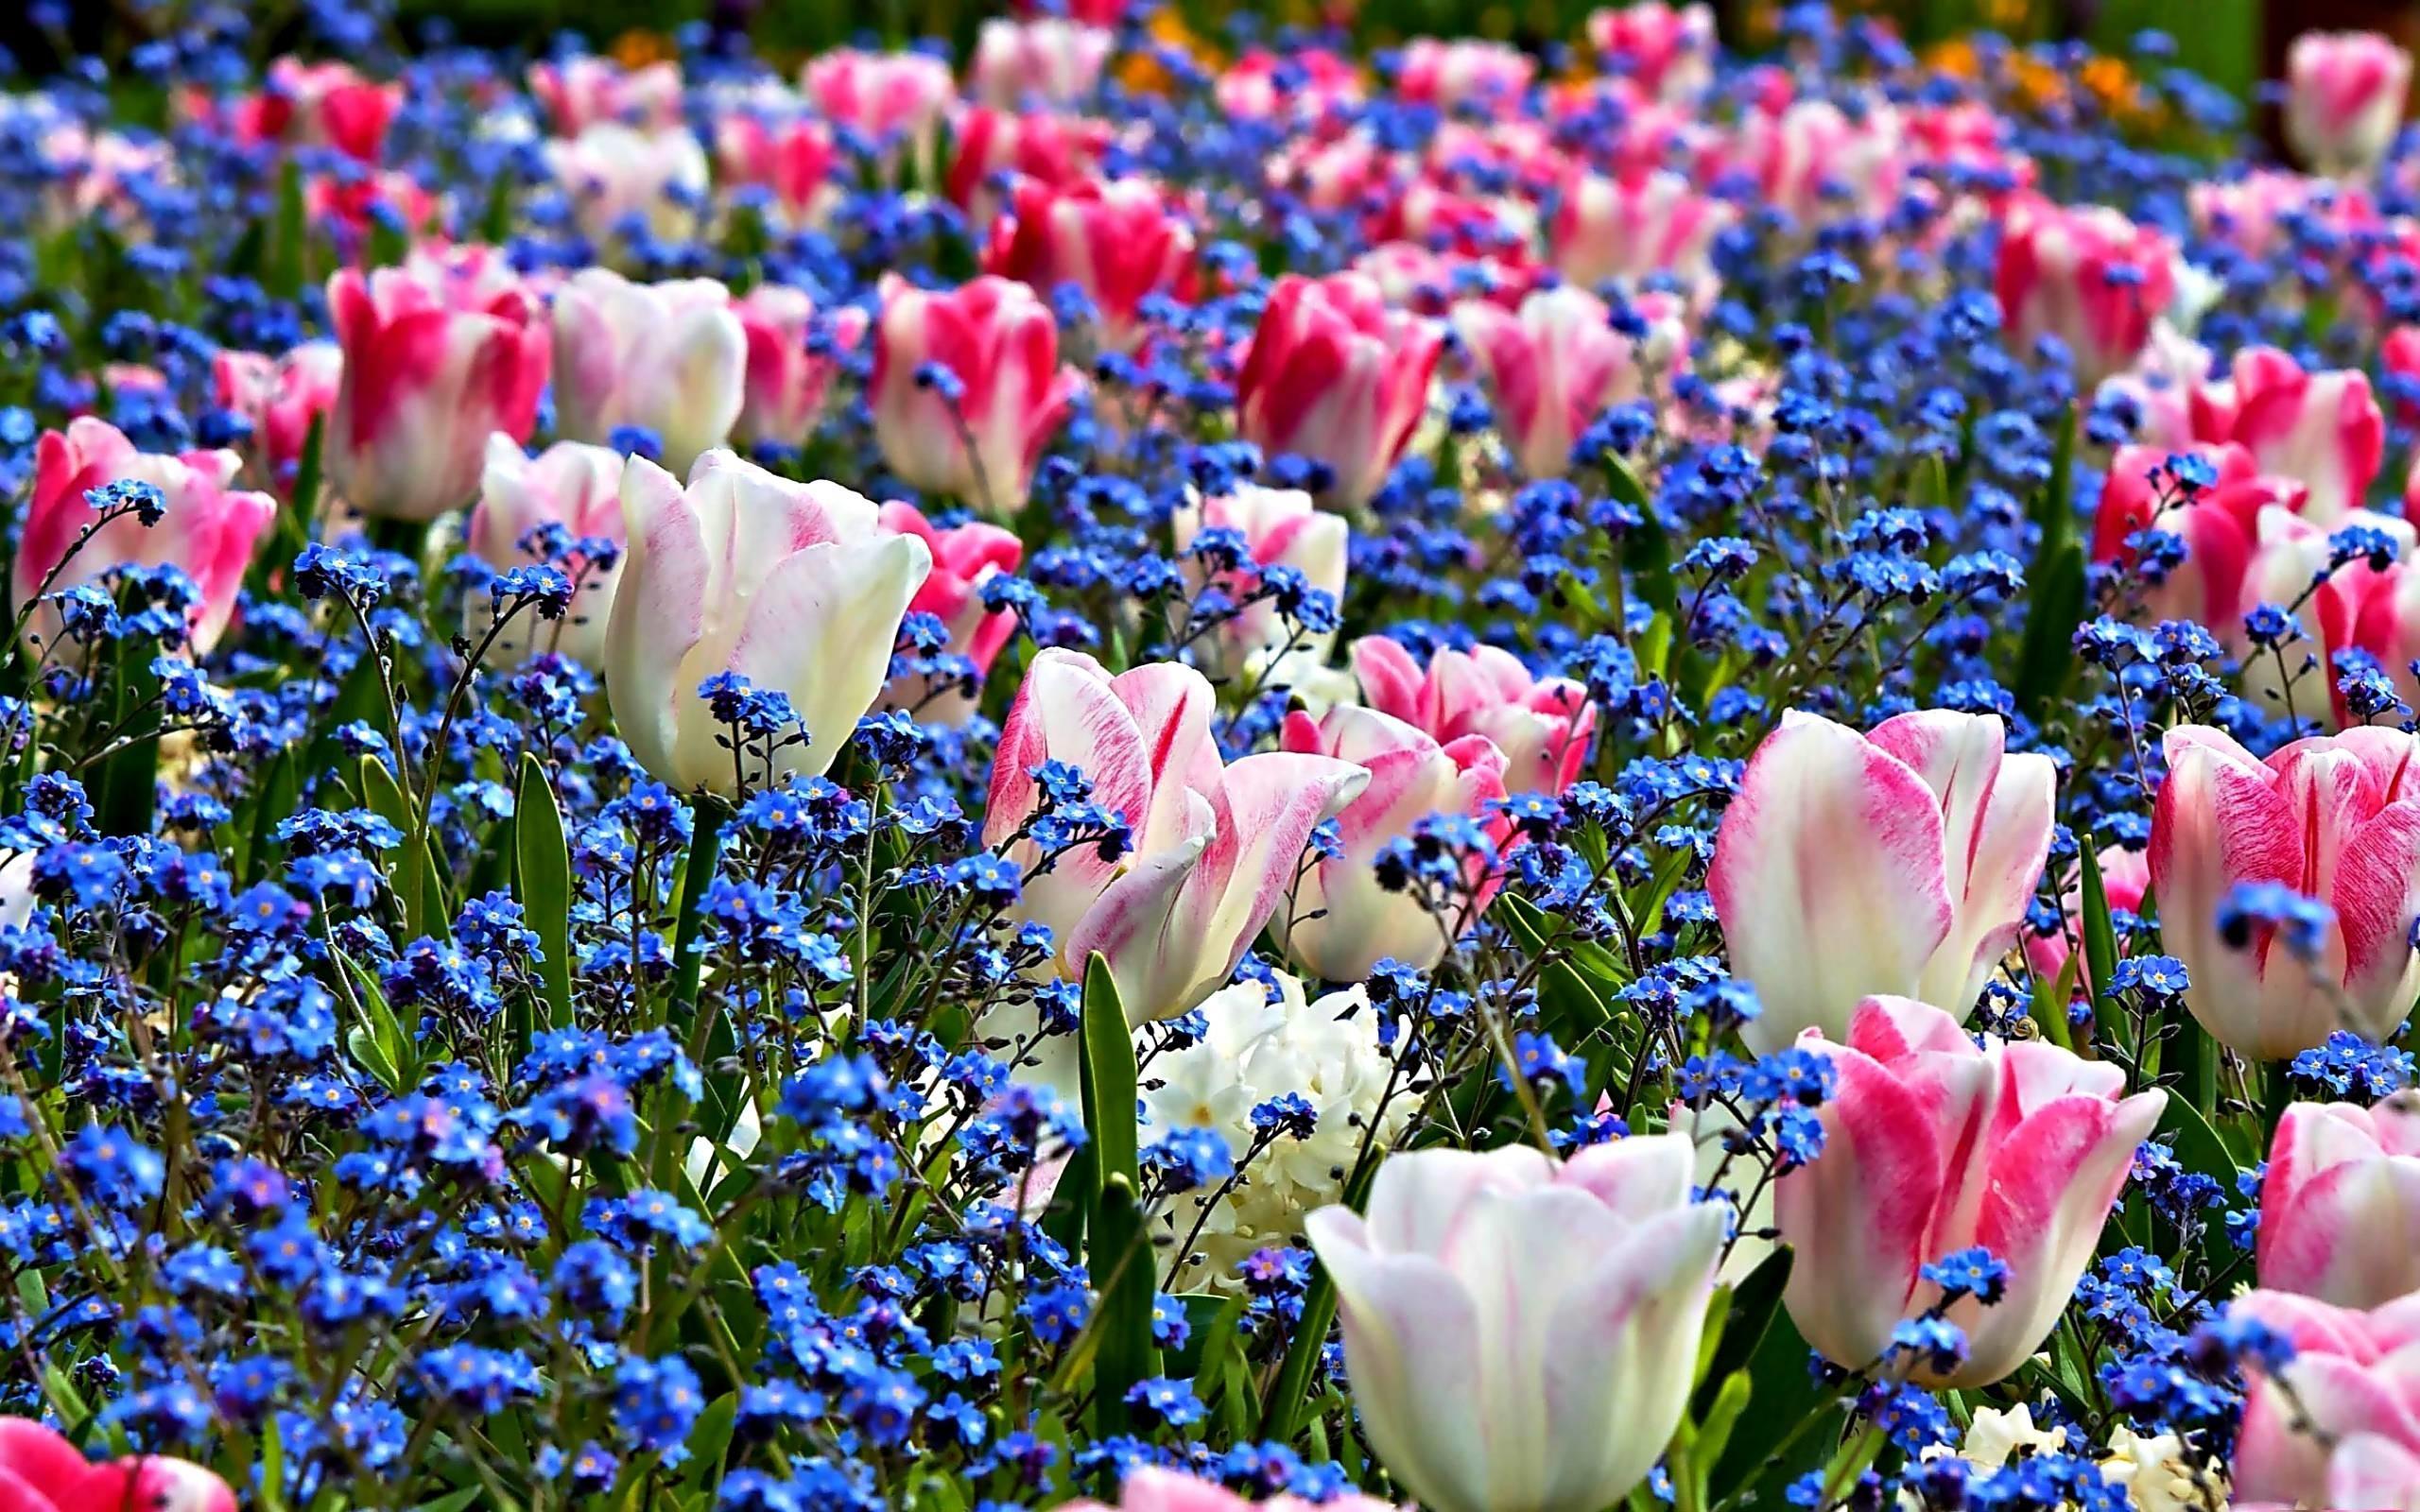 Desktop Wallpaper Spring Flowers 60 images 2560x1600